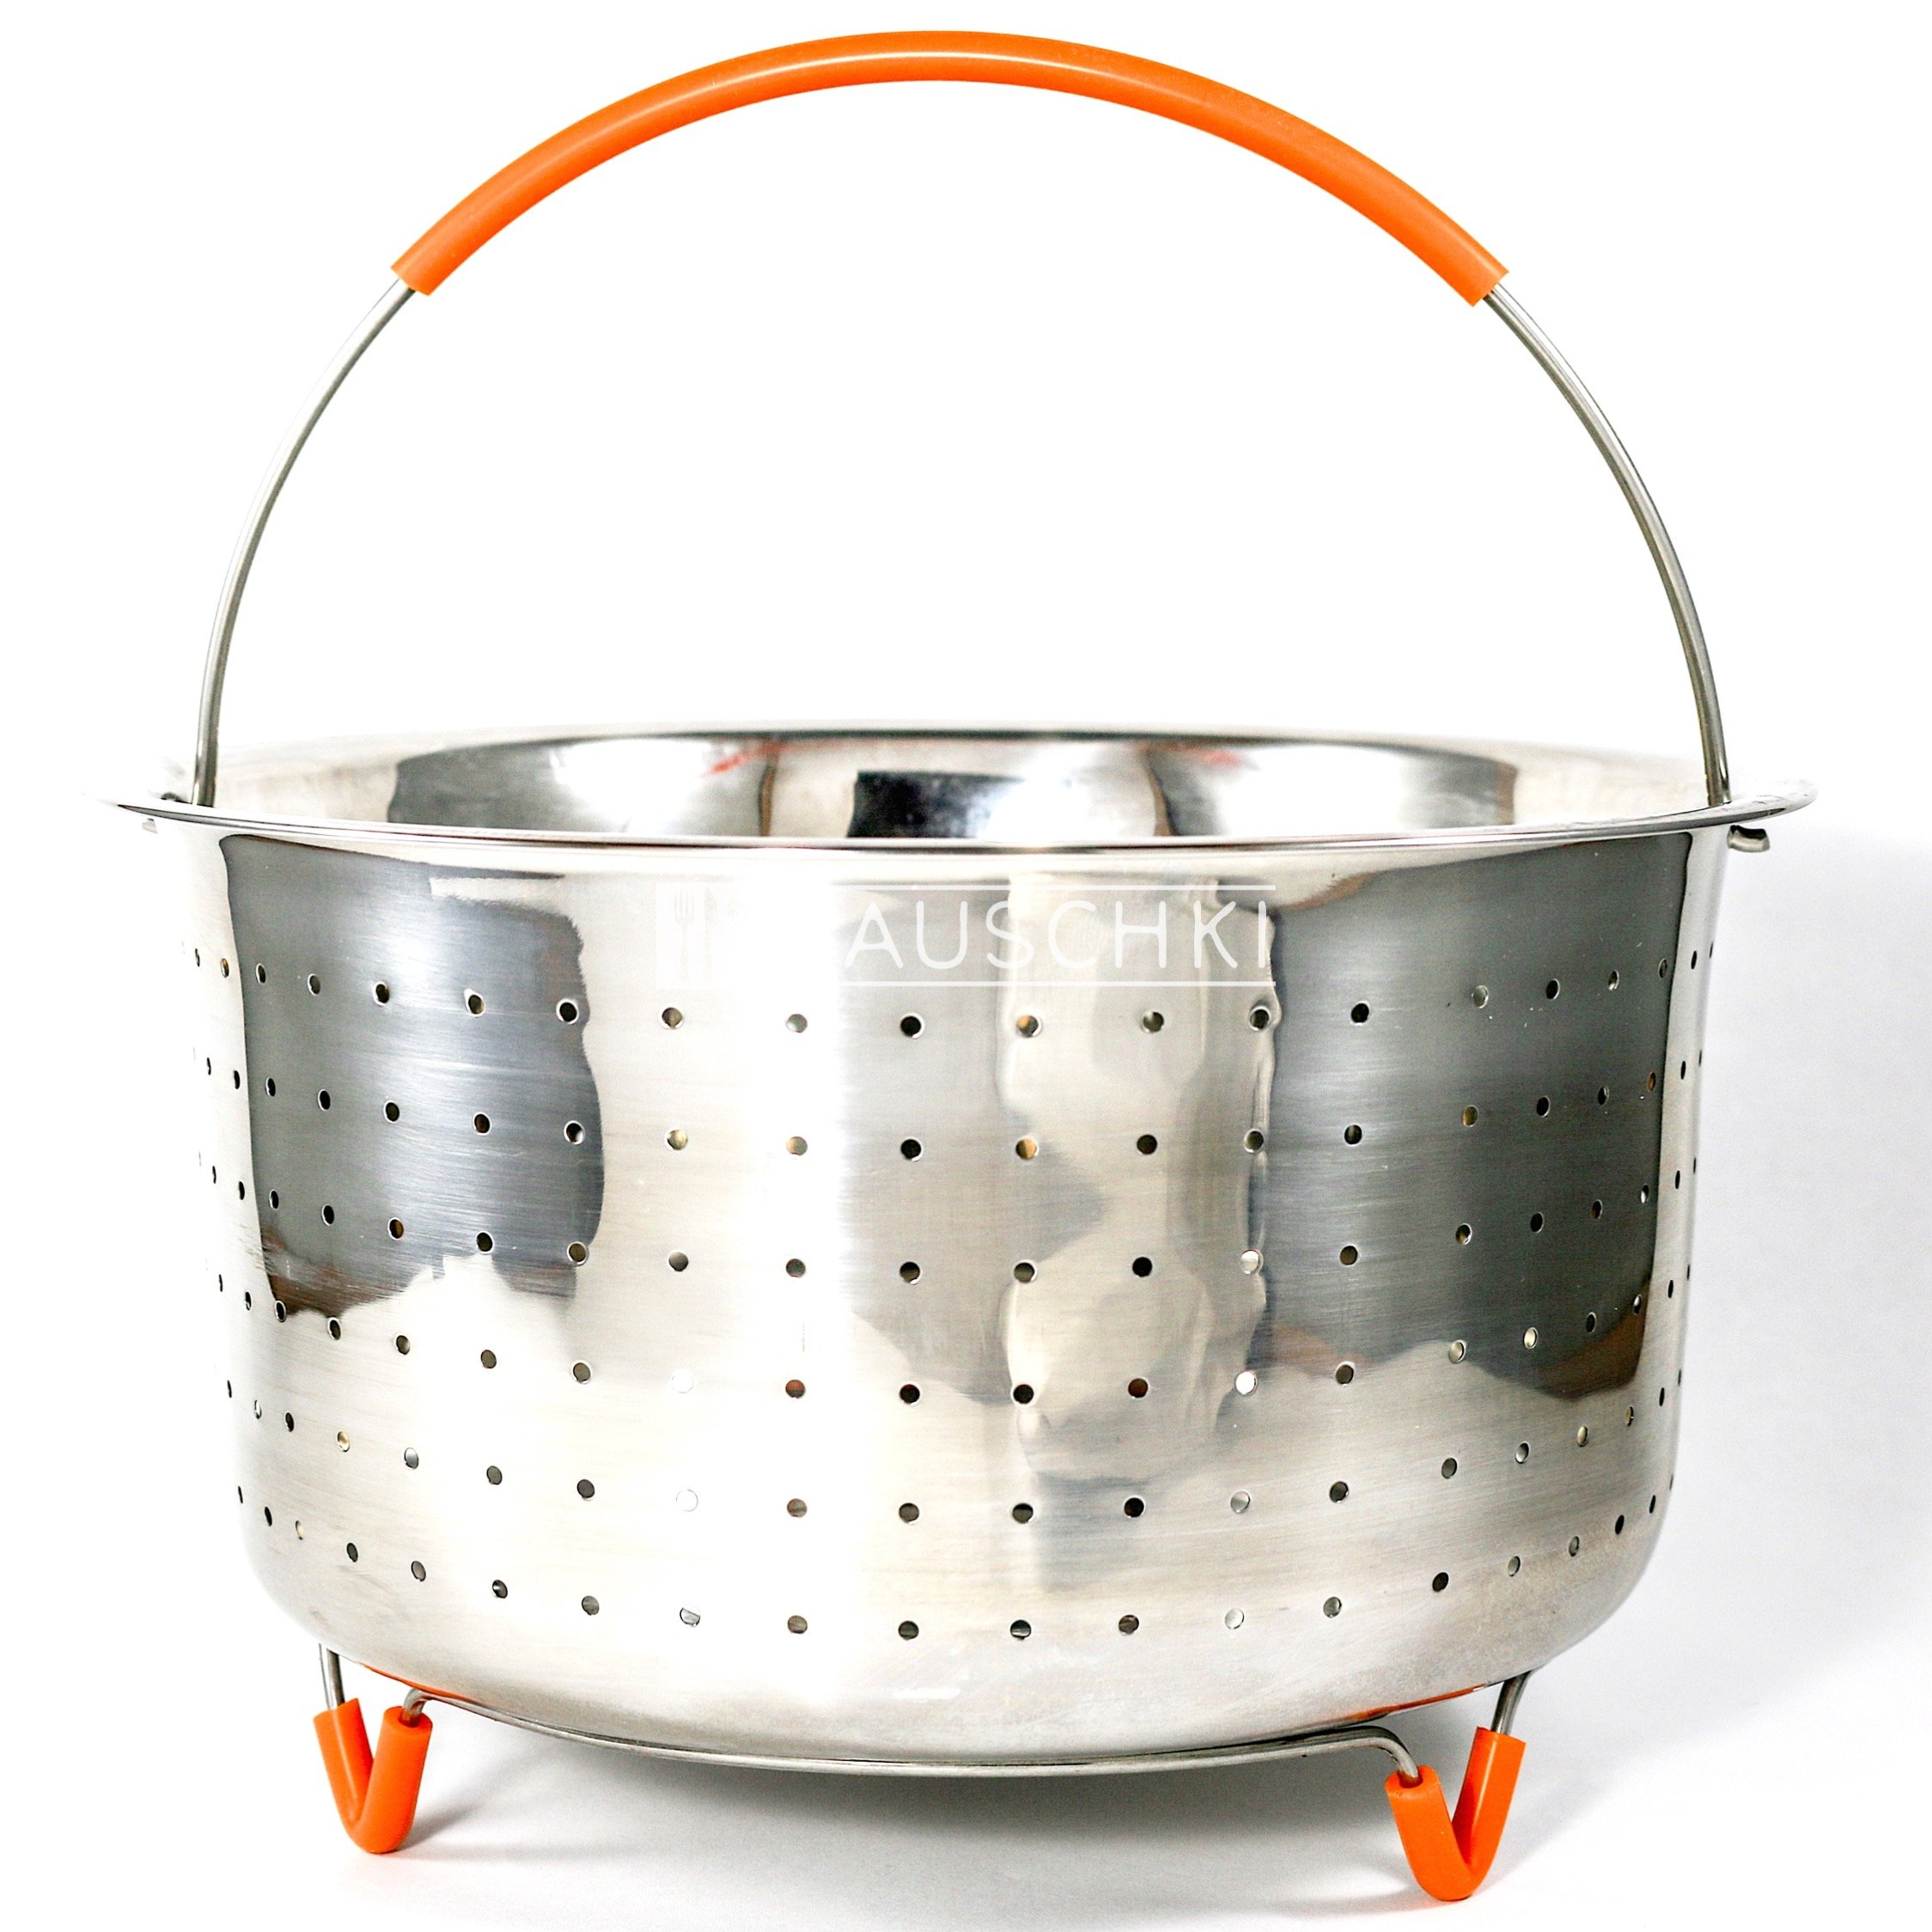 Bauschki Instant Pot Accessories, Vegetable Steamer Basket for instapot 6qt, 8qt - Egg Meat Food Rice Dumpling Cooker 6 qt, 8 quart Accessory - Stainless Steel, BPA Free Non-Slip Silicone Handle &Legs